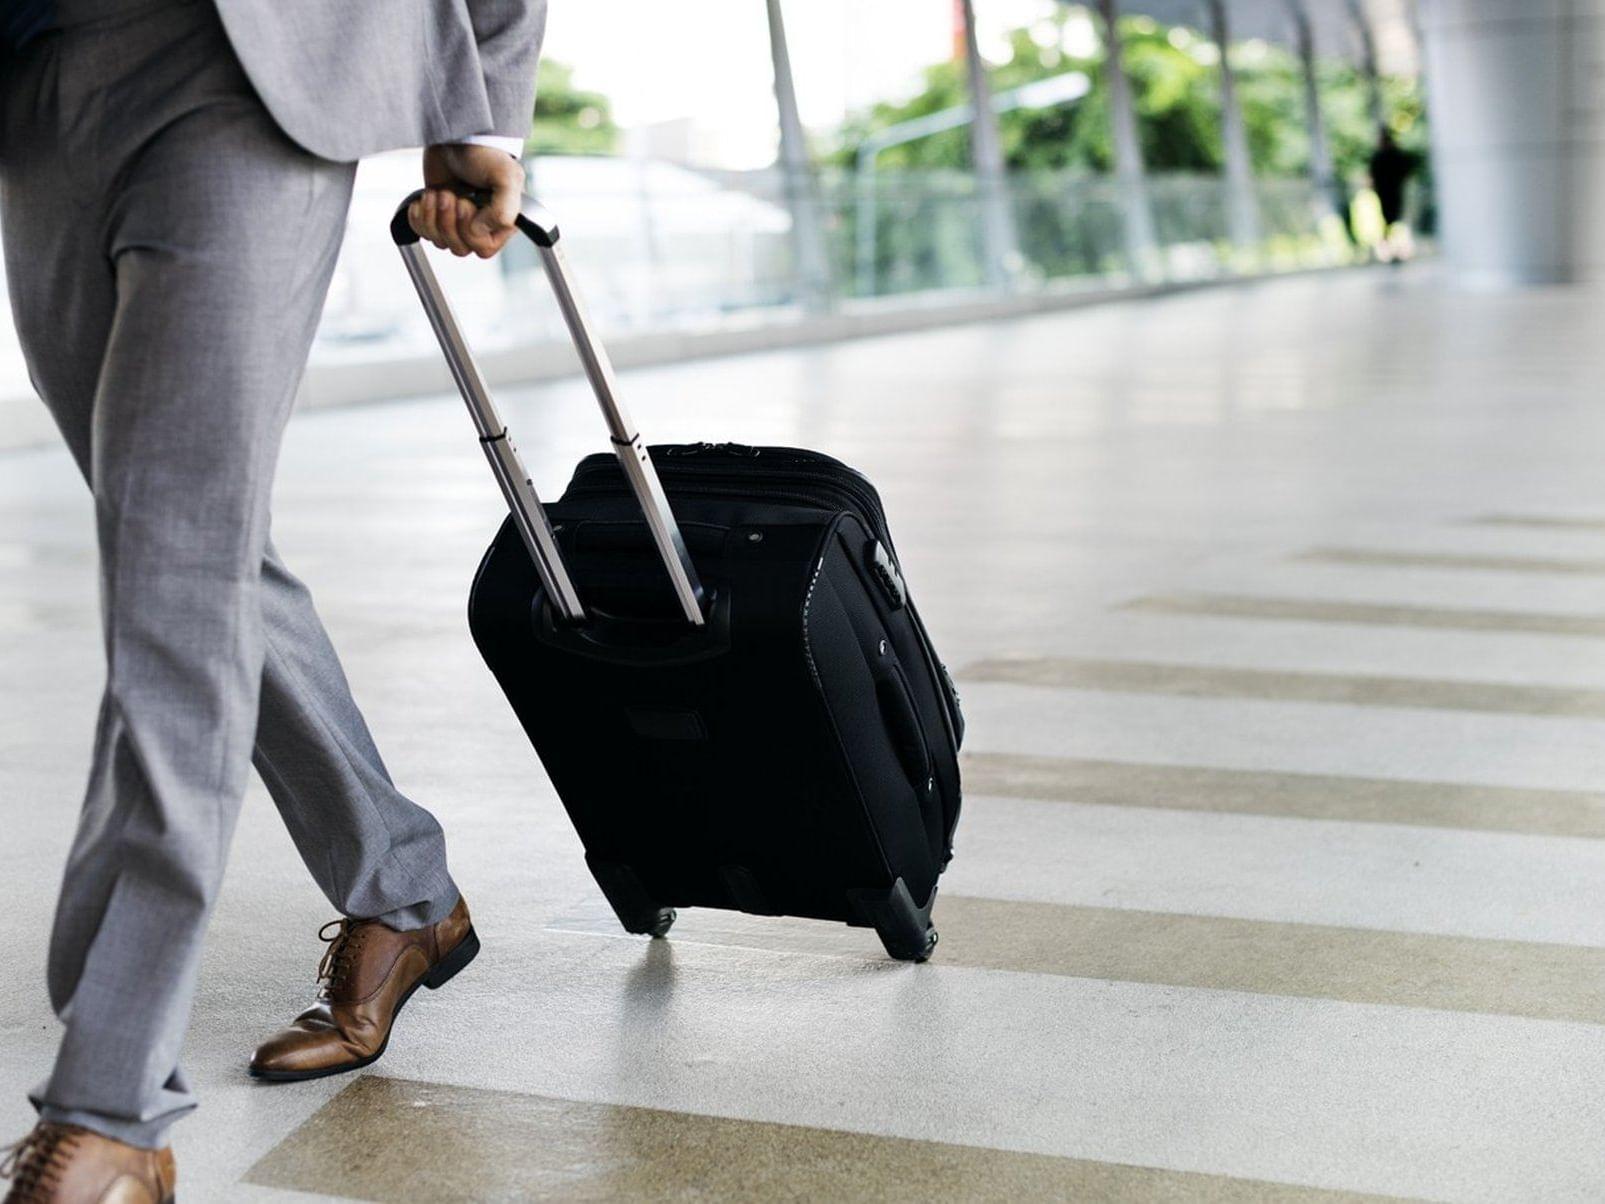 man rolling suitcase